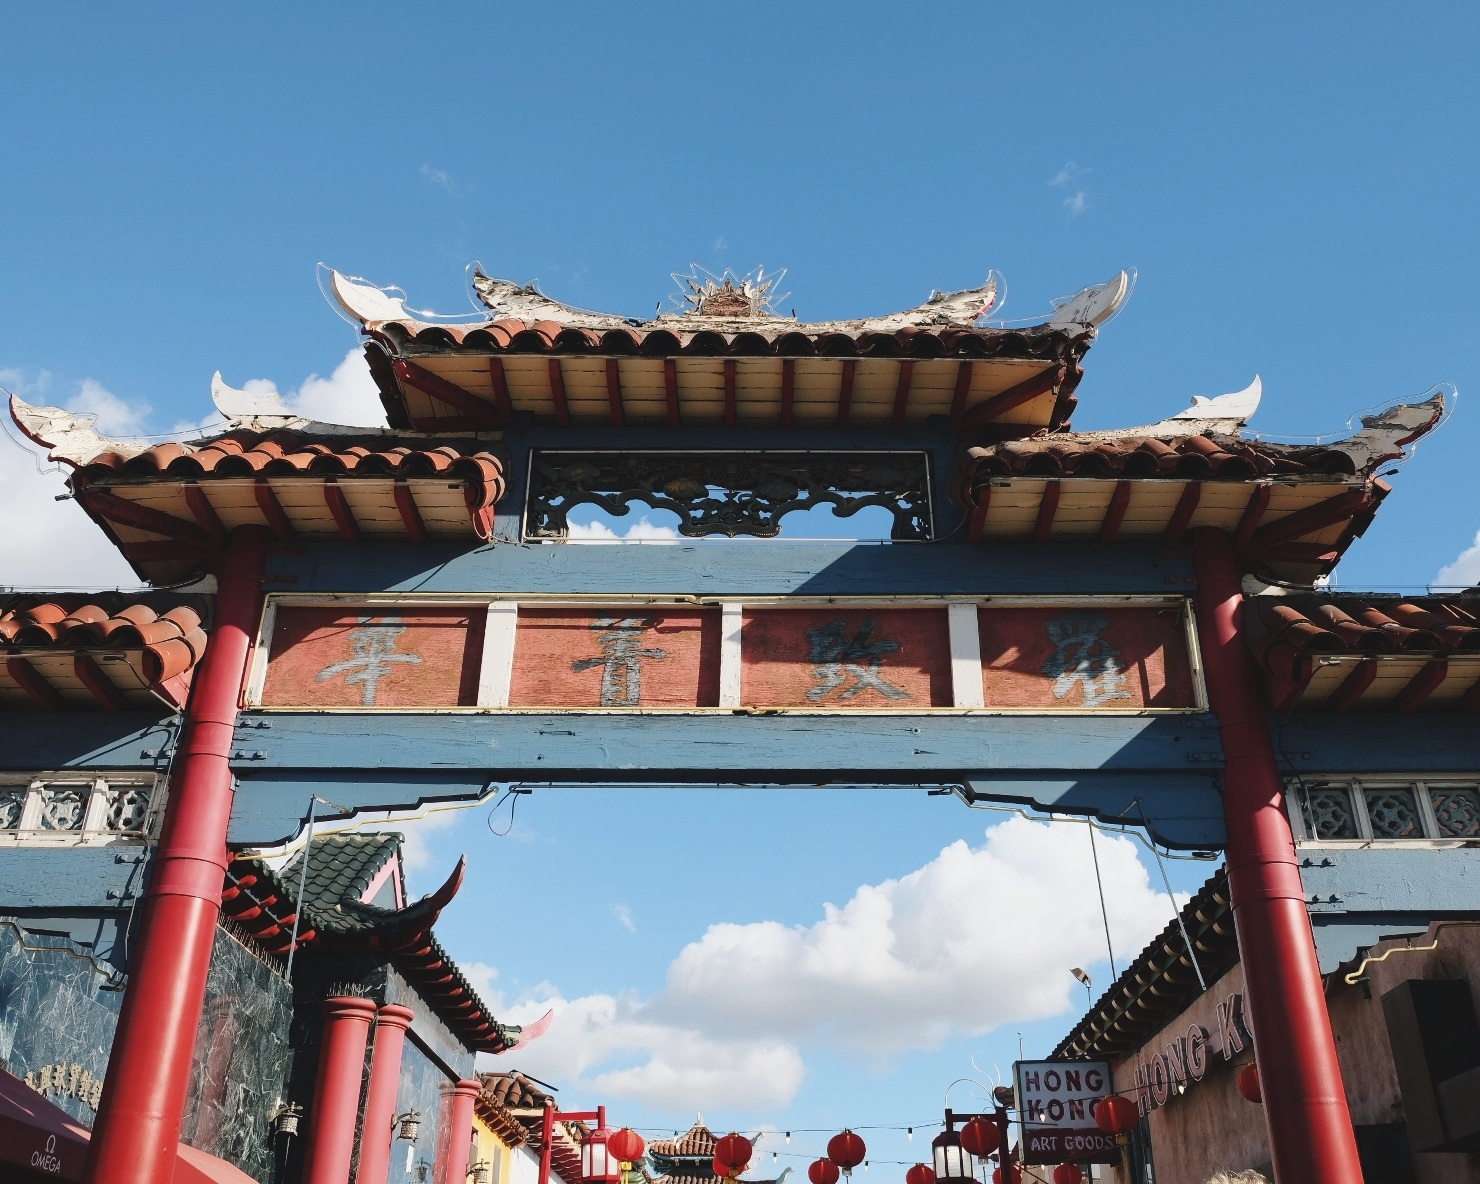 Gates of Los Angeles Chinatown